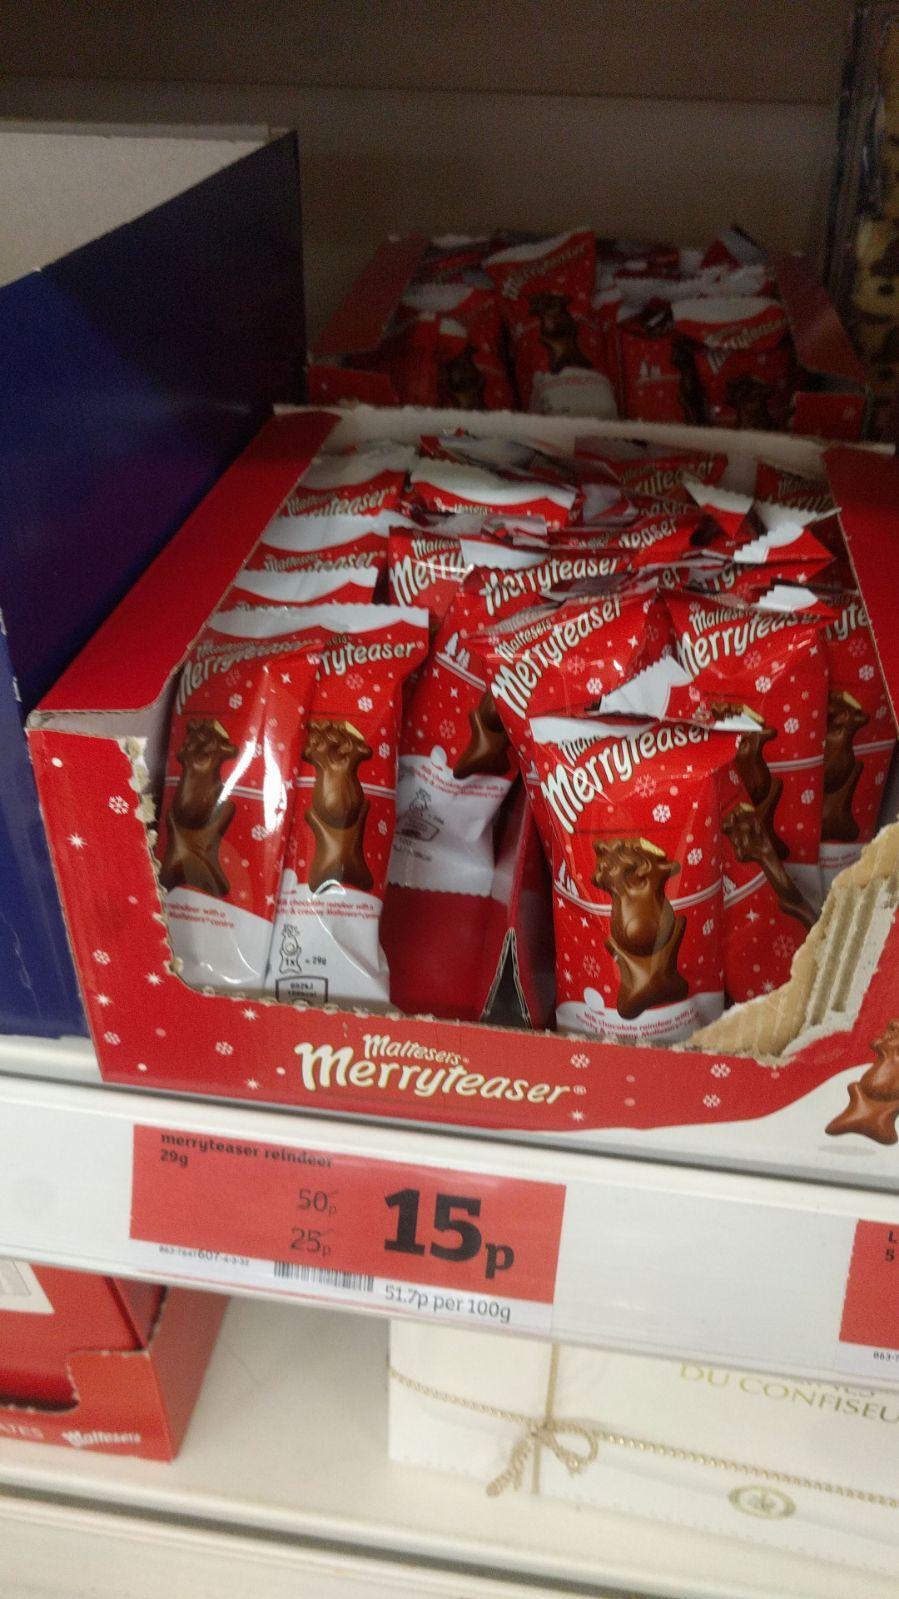 Malteser Chocolate Reindeer 15p @ Sainsbury's